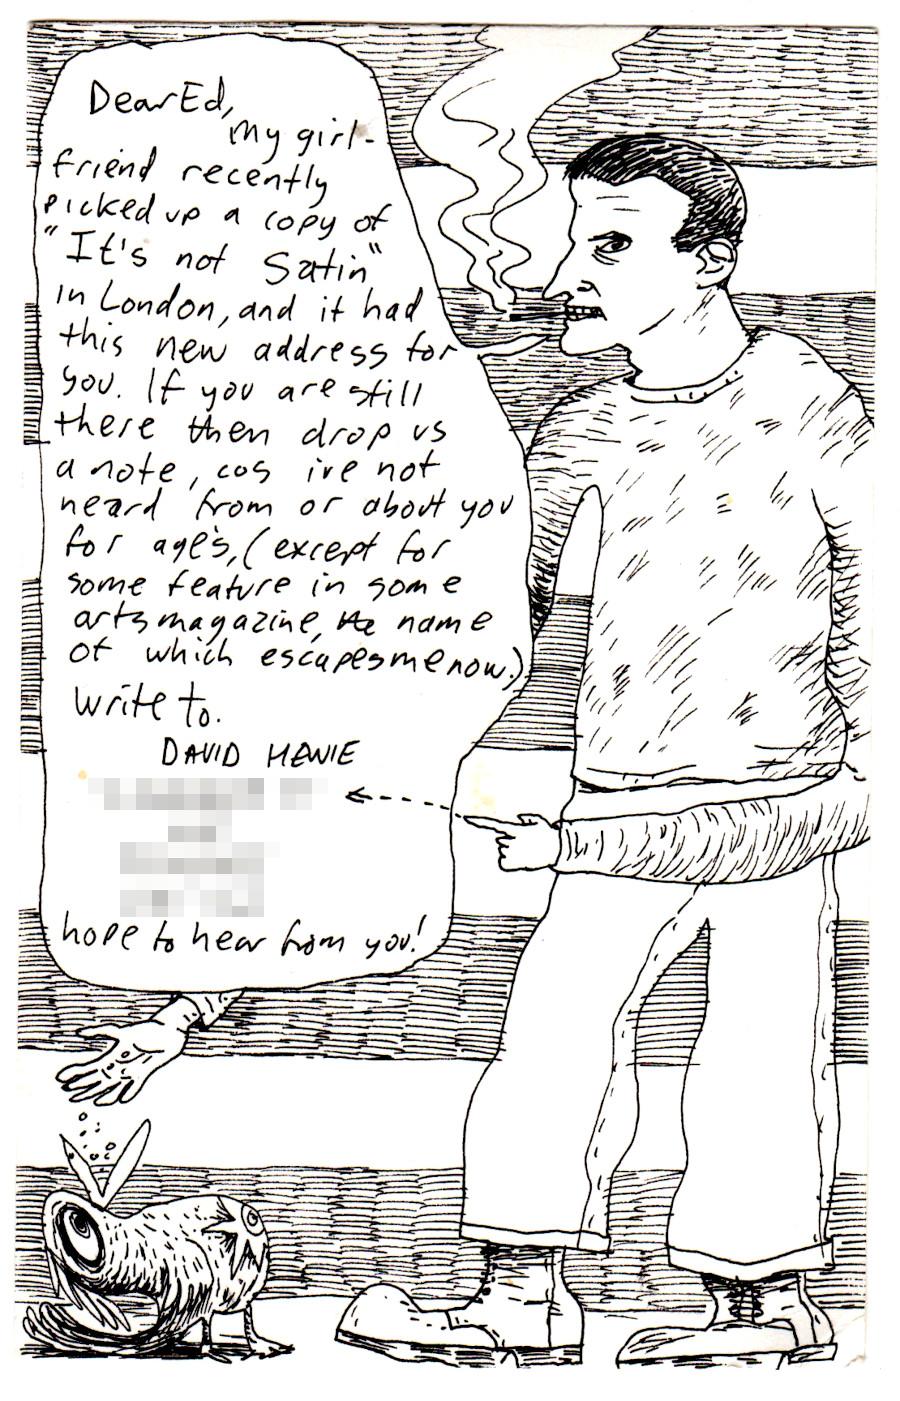 A postcard from David Hewie